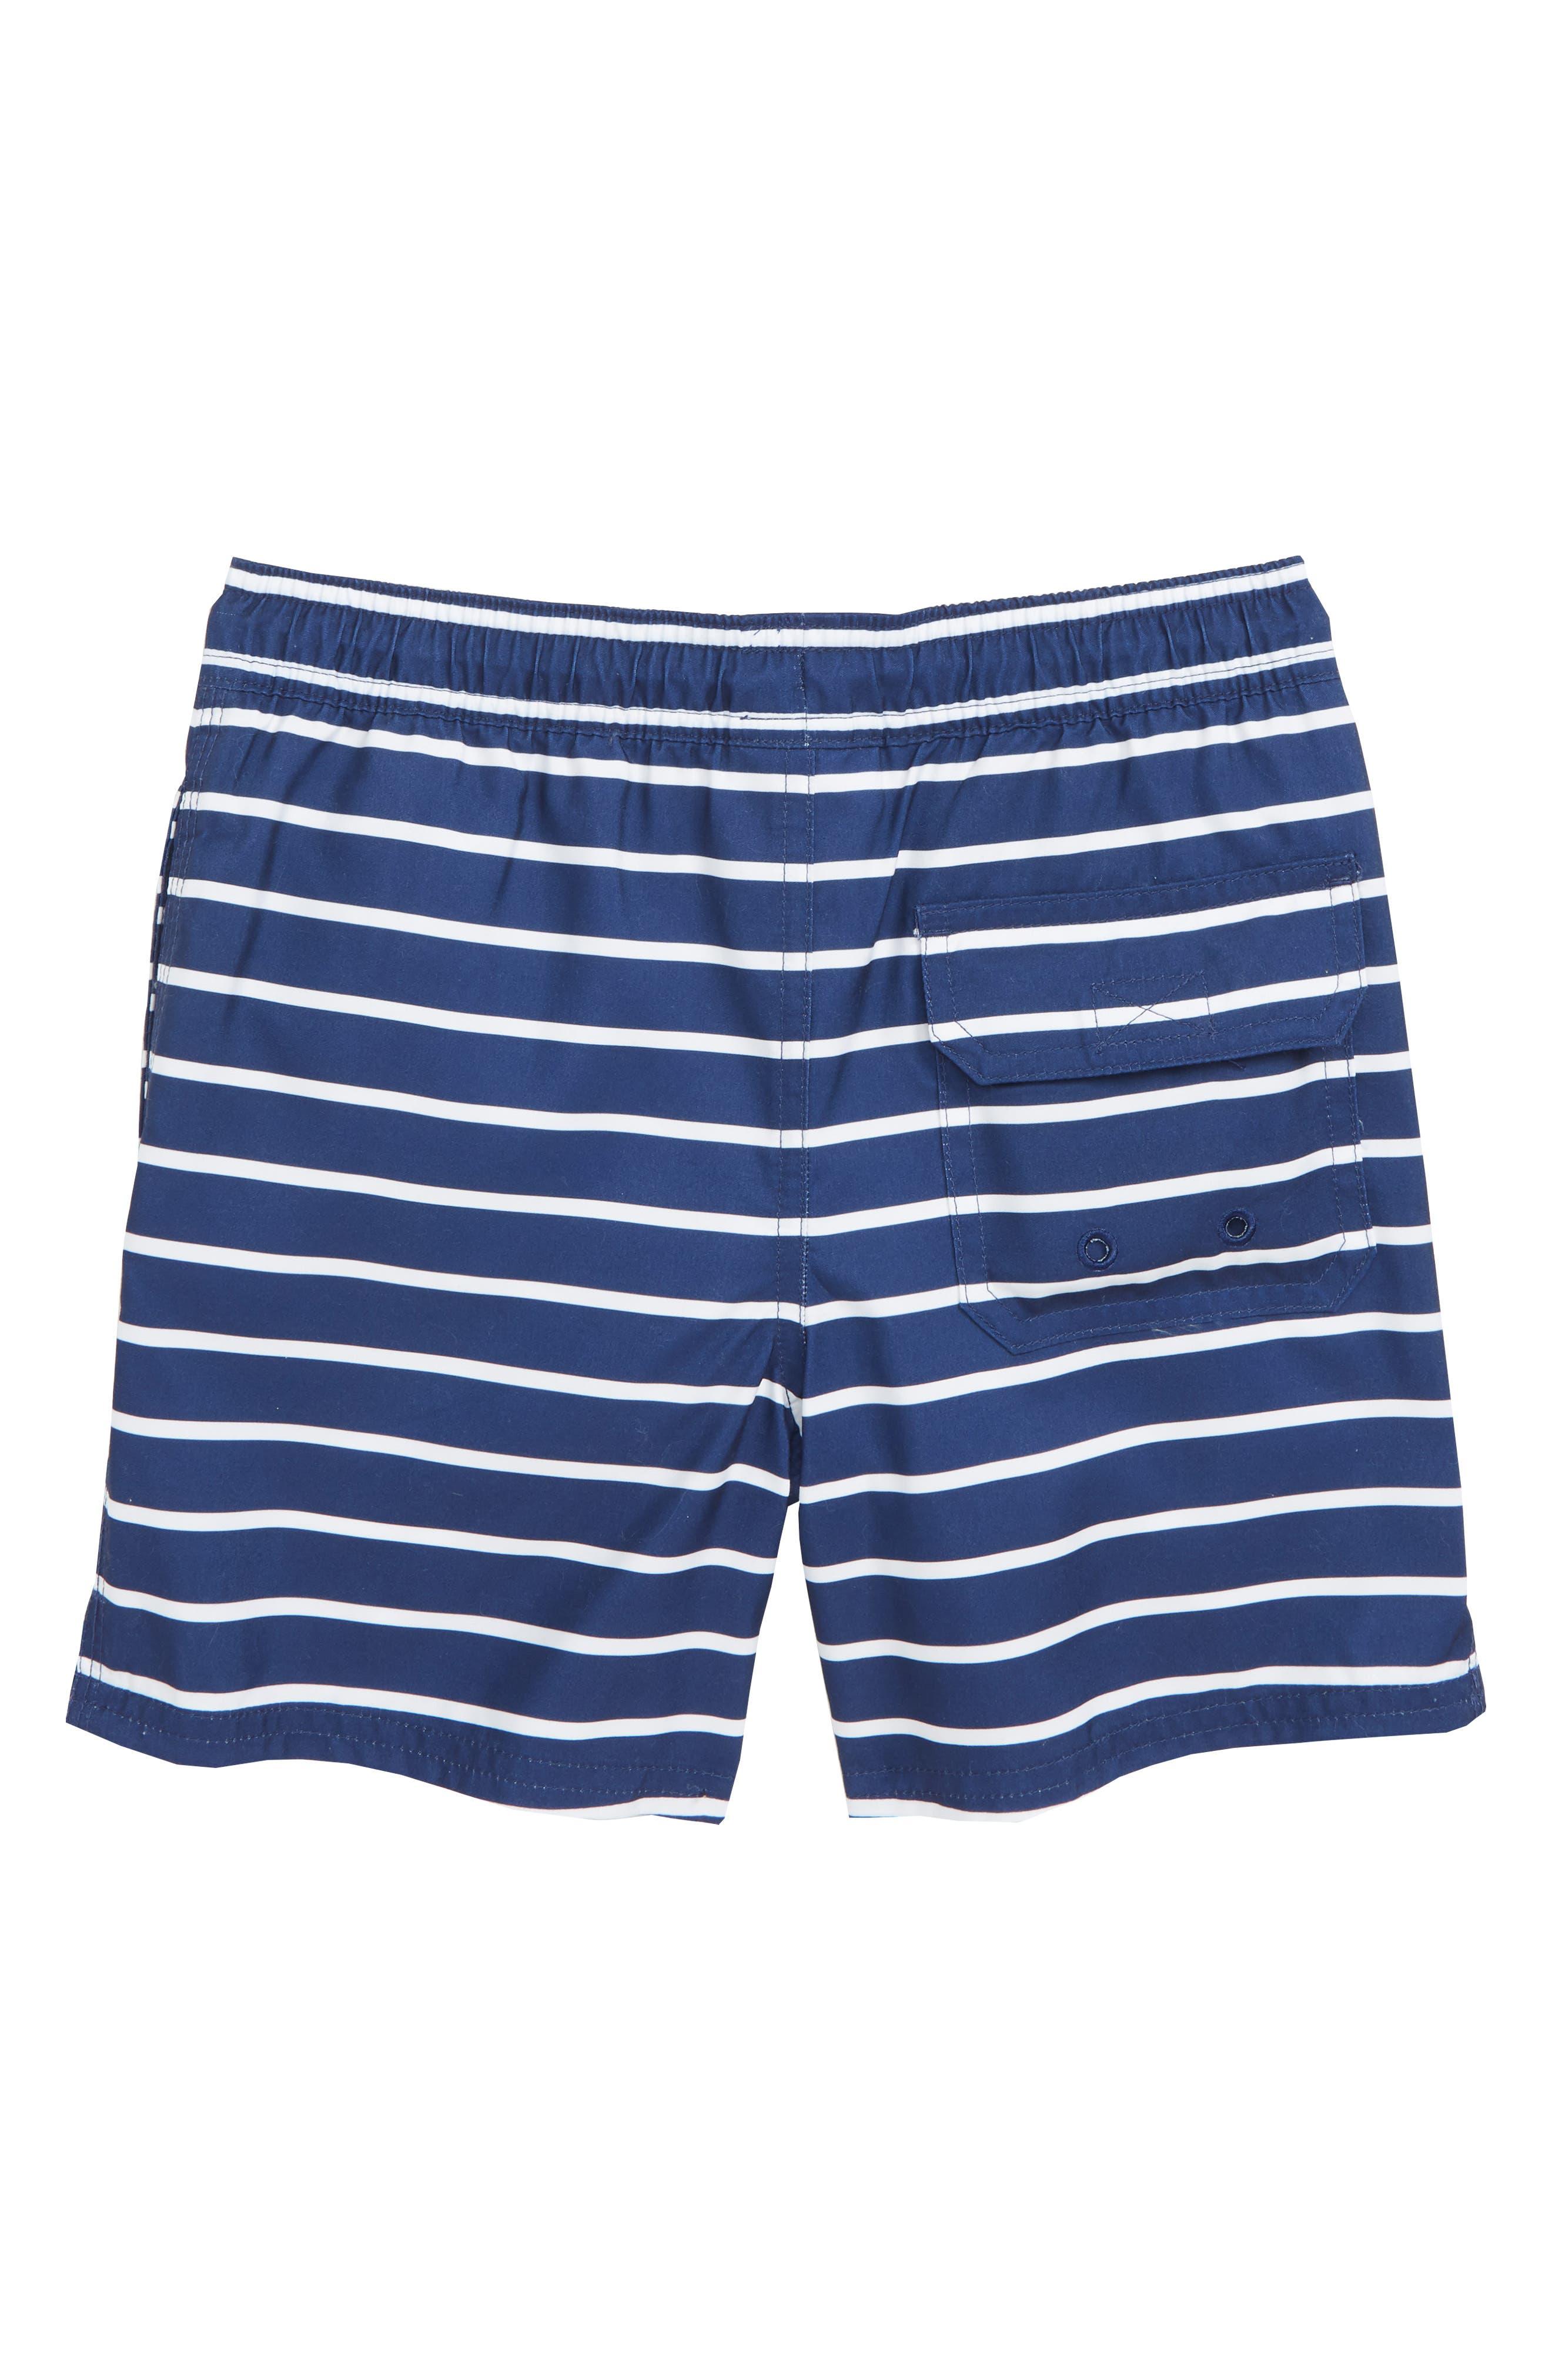 Break Stripe Chappy Swim Trunks,                             Alternate thumbnail 2, color,                             DEEP BAY